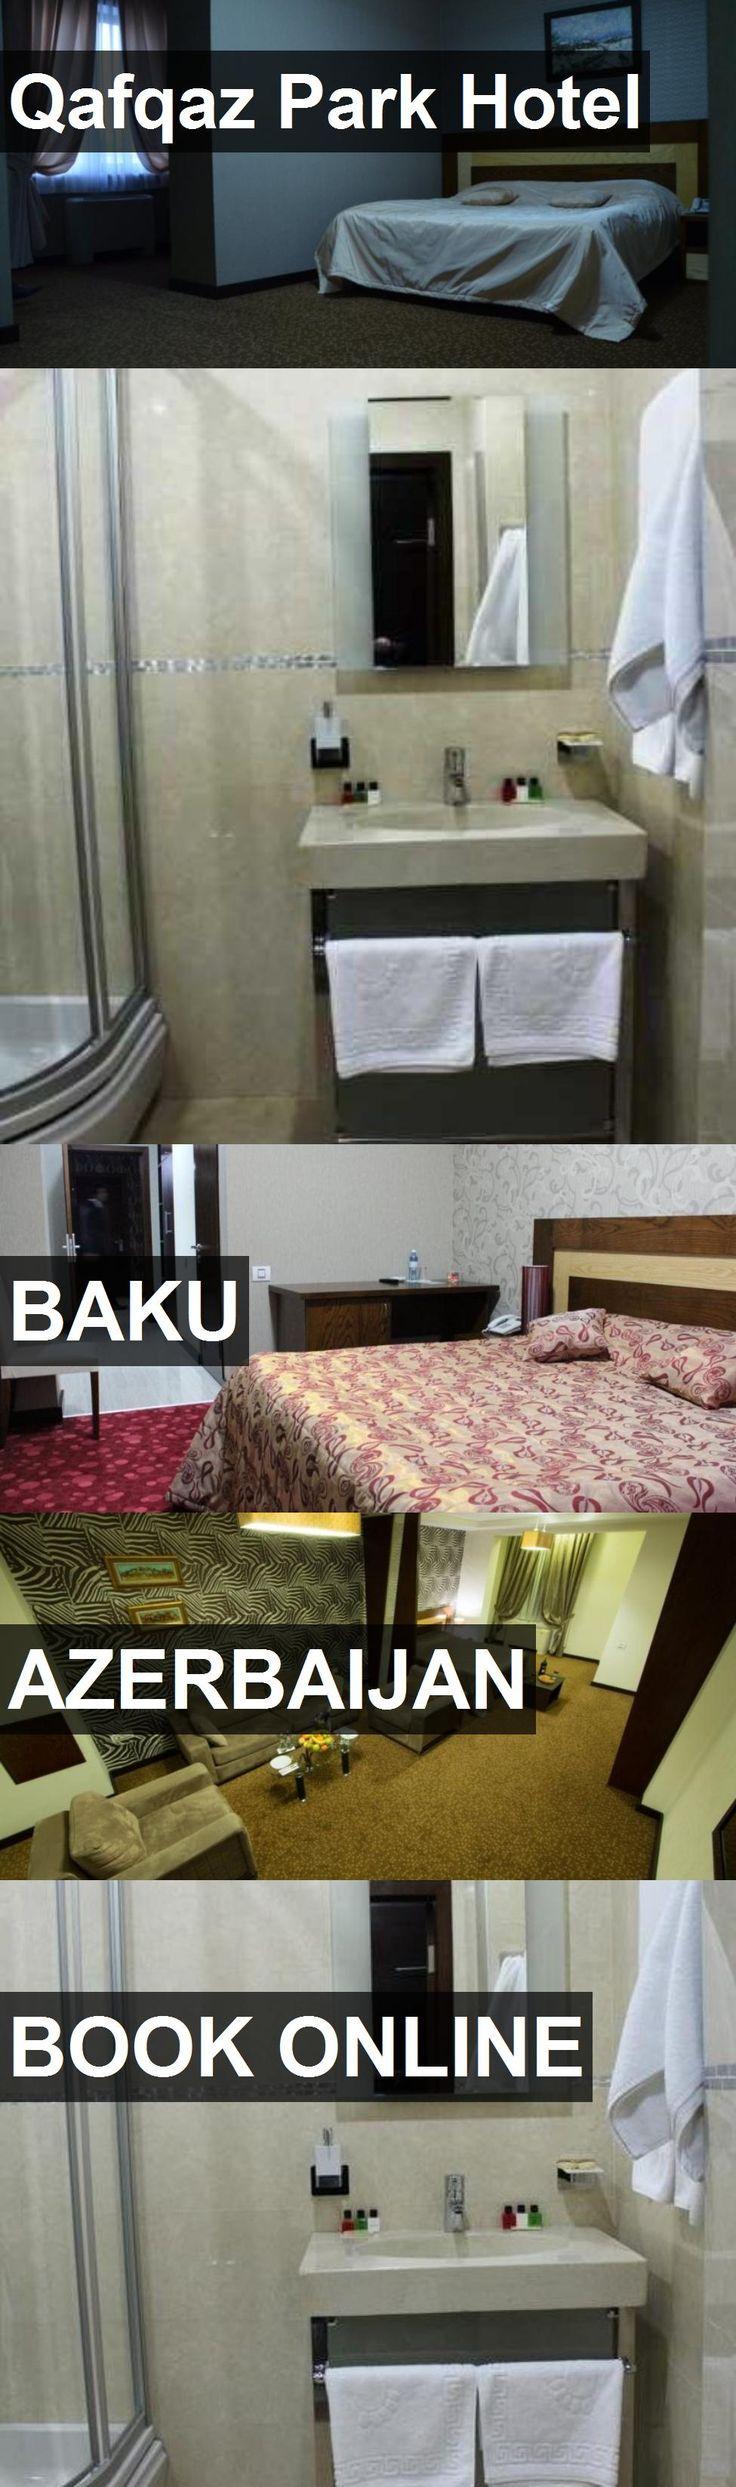 Qafqaz Park Hotel in Baku, Azerbaijan. For more information, photos, reviews and best prices please follow the link. #Azerbaijan #Baku #travel #vacation #hotel